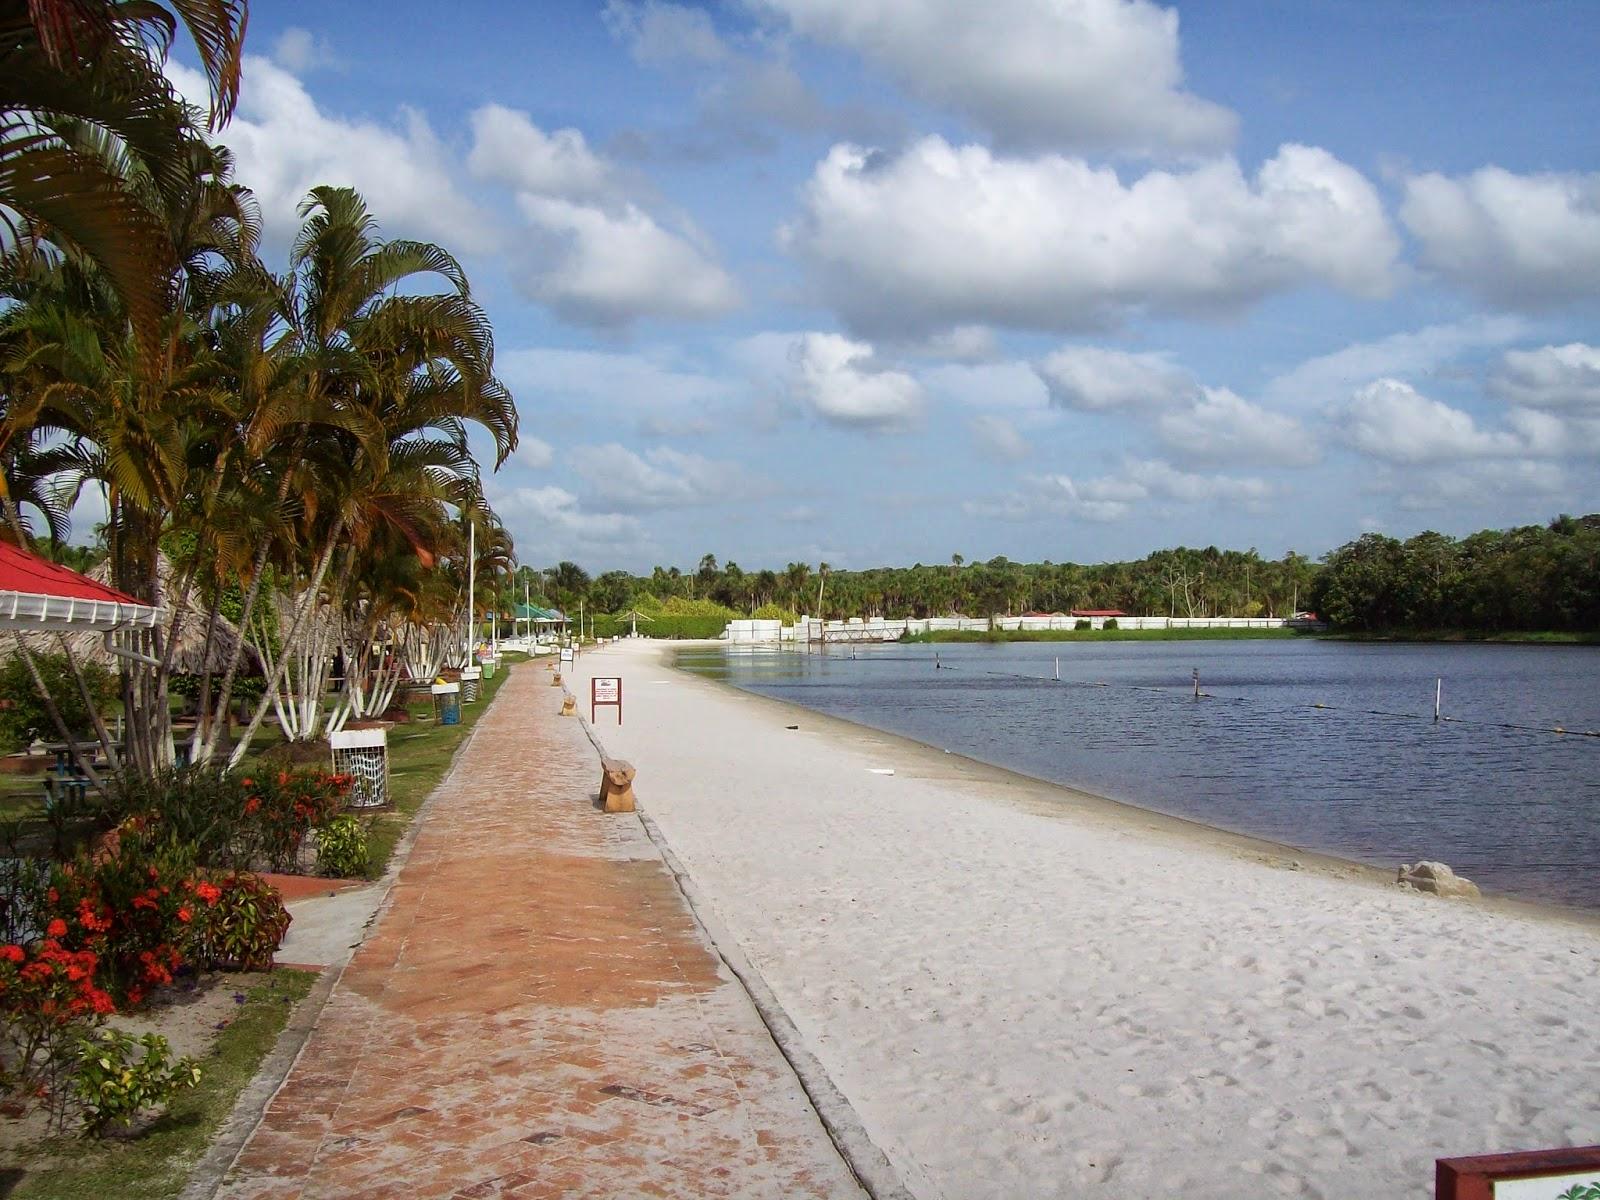 Guyana land of many waters